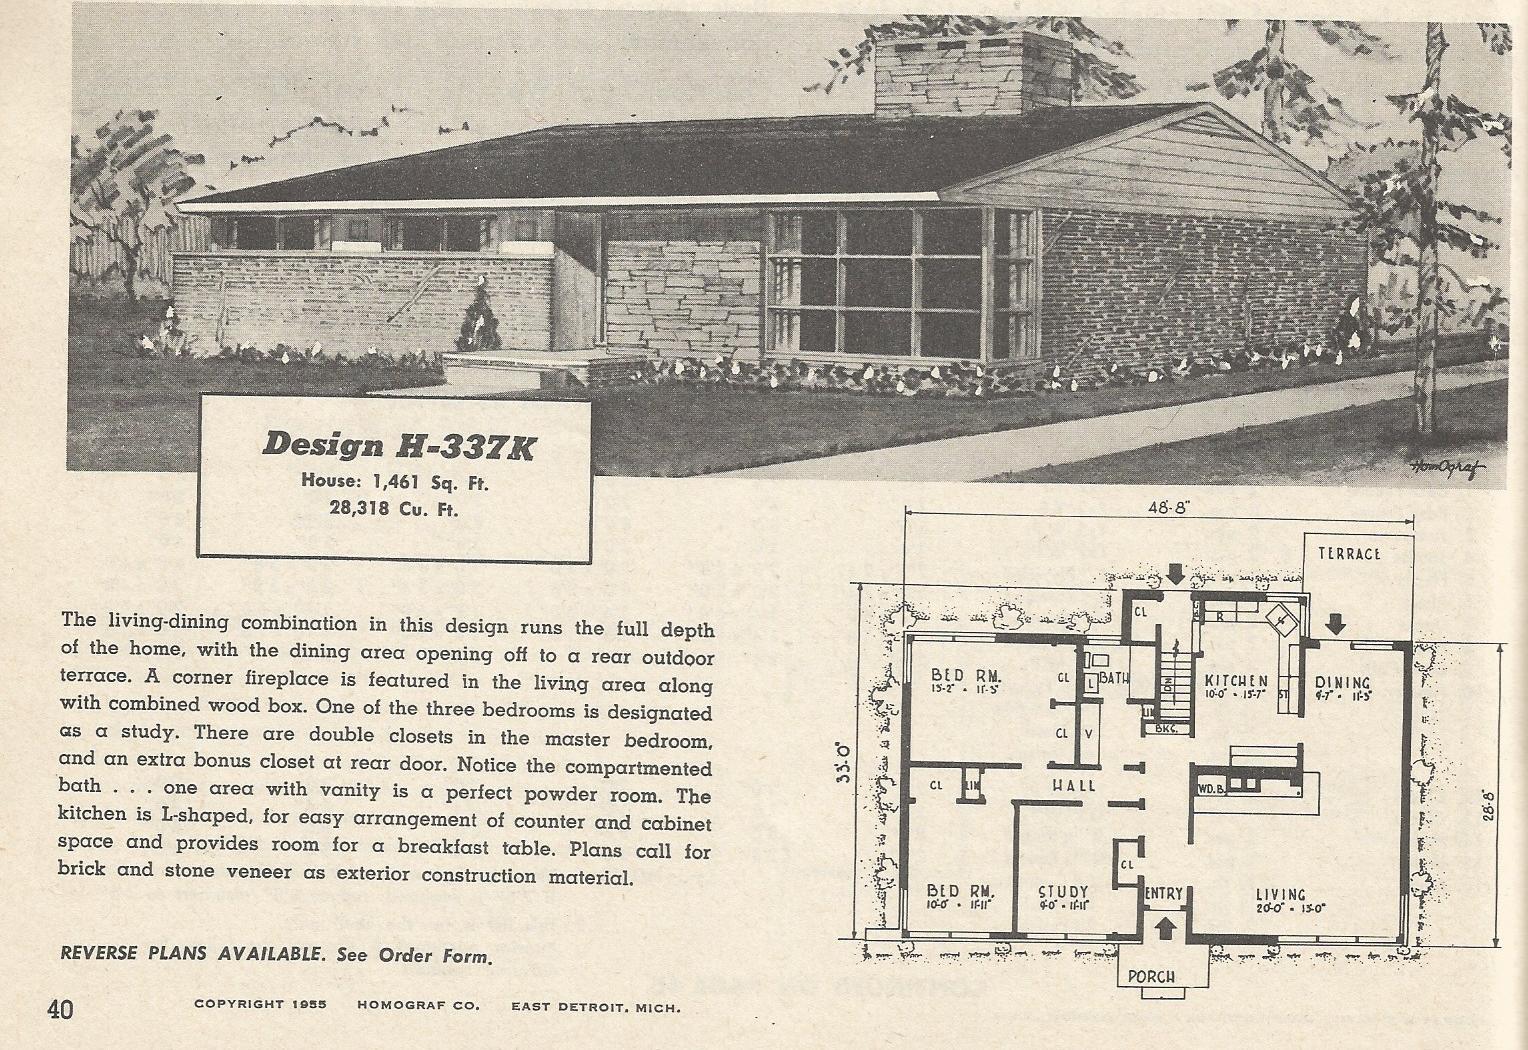 Vintage house plans 337 antique alter ego for Retro modern house plans